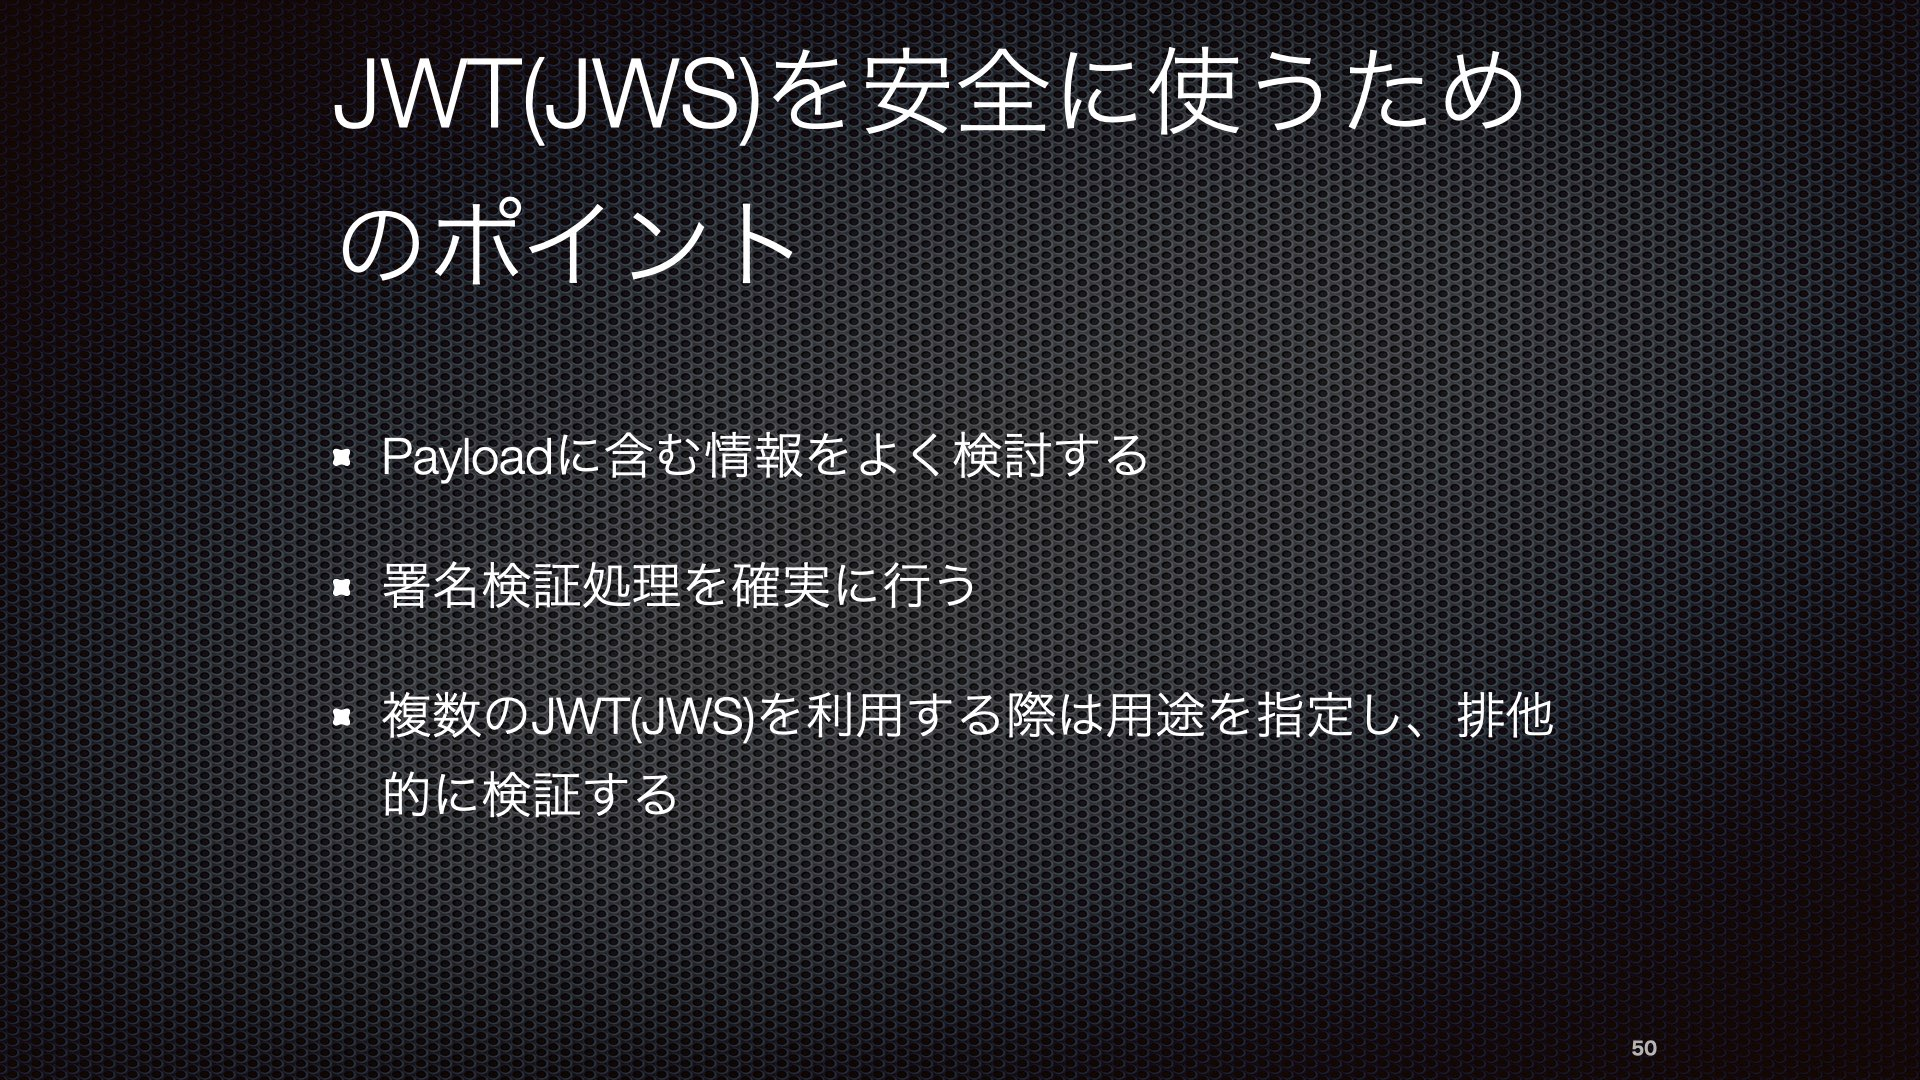 JWTBootCamp2020 050